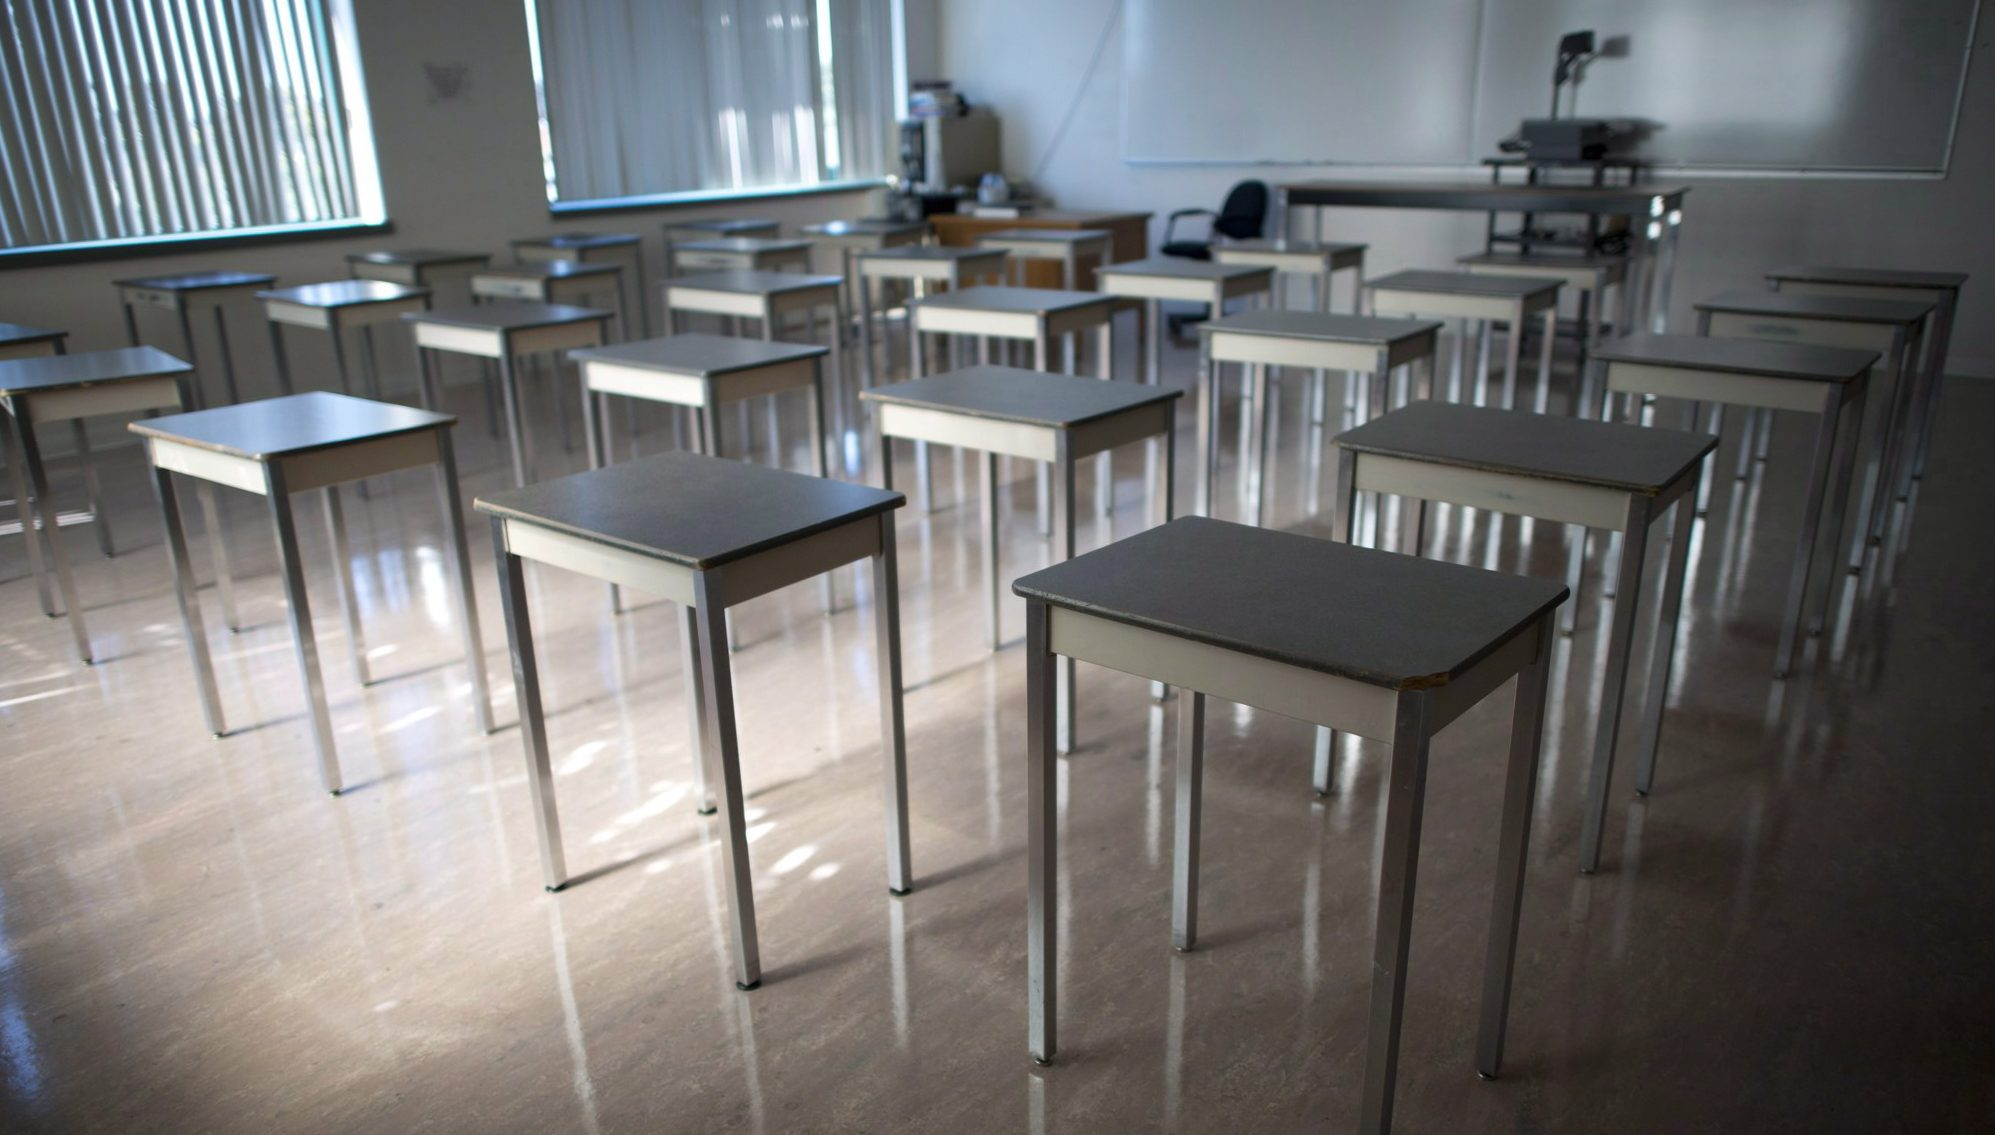 Teachers' unions allege plan breaks provincial law as province unlocks $500M in reserve funds - CityNews Toronto